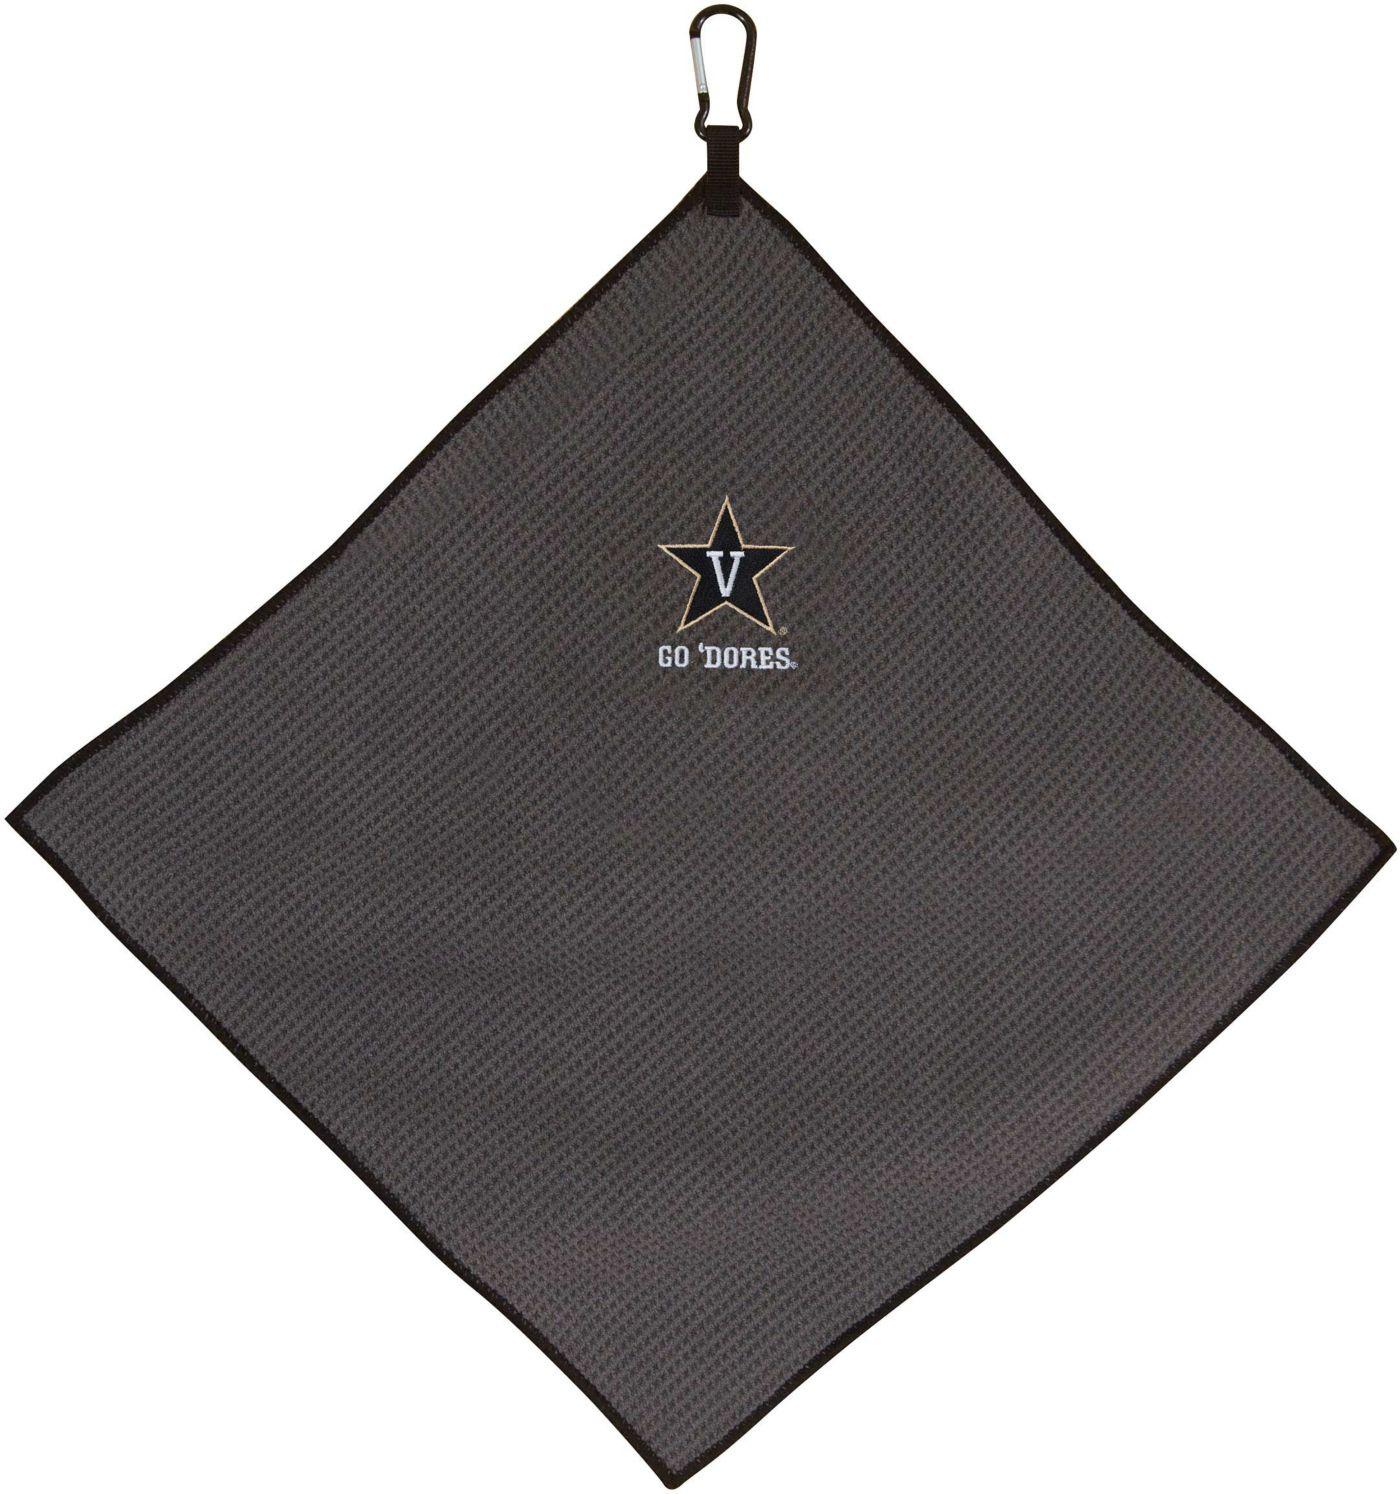 "Team Effort Vanderbilt Commodores 15"" x 15"" Microfiber Golf Towel"